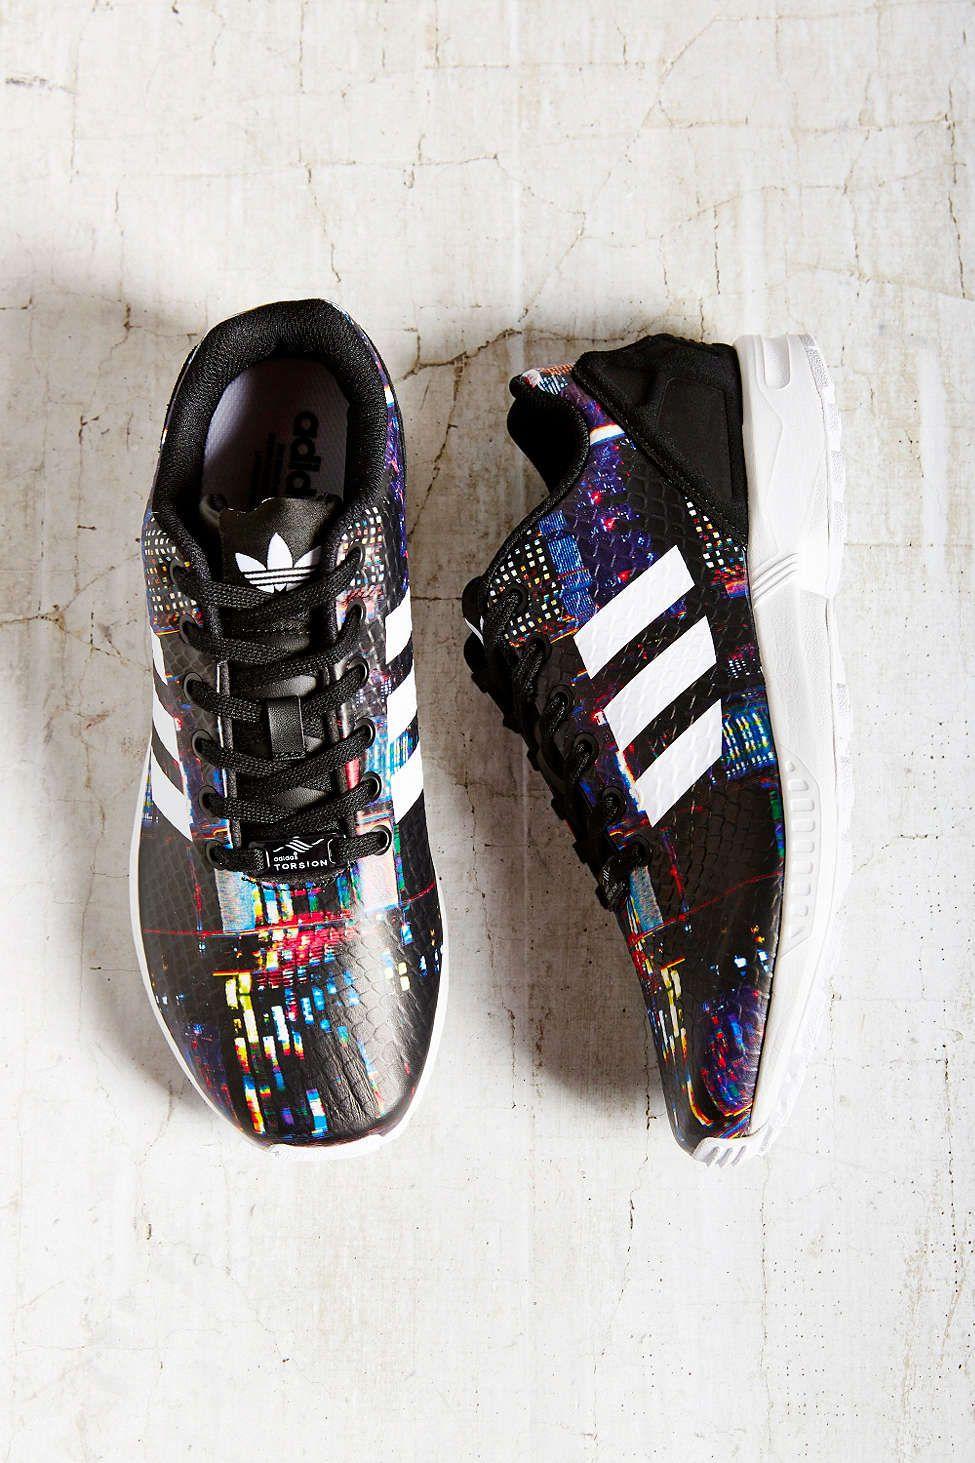 Adidas Originali Zx Flusso Città Stampa In Scarpe Da Ginnastica Diamoci